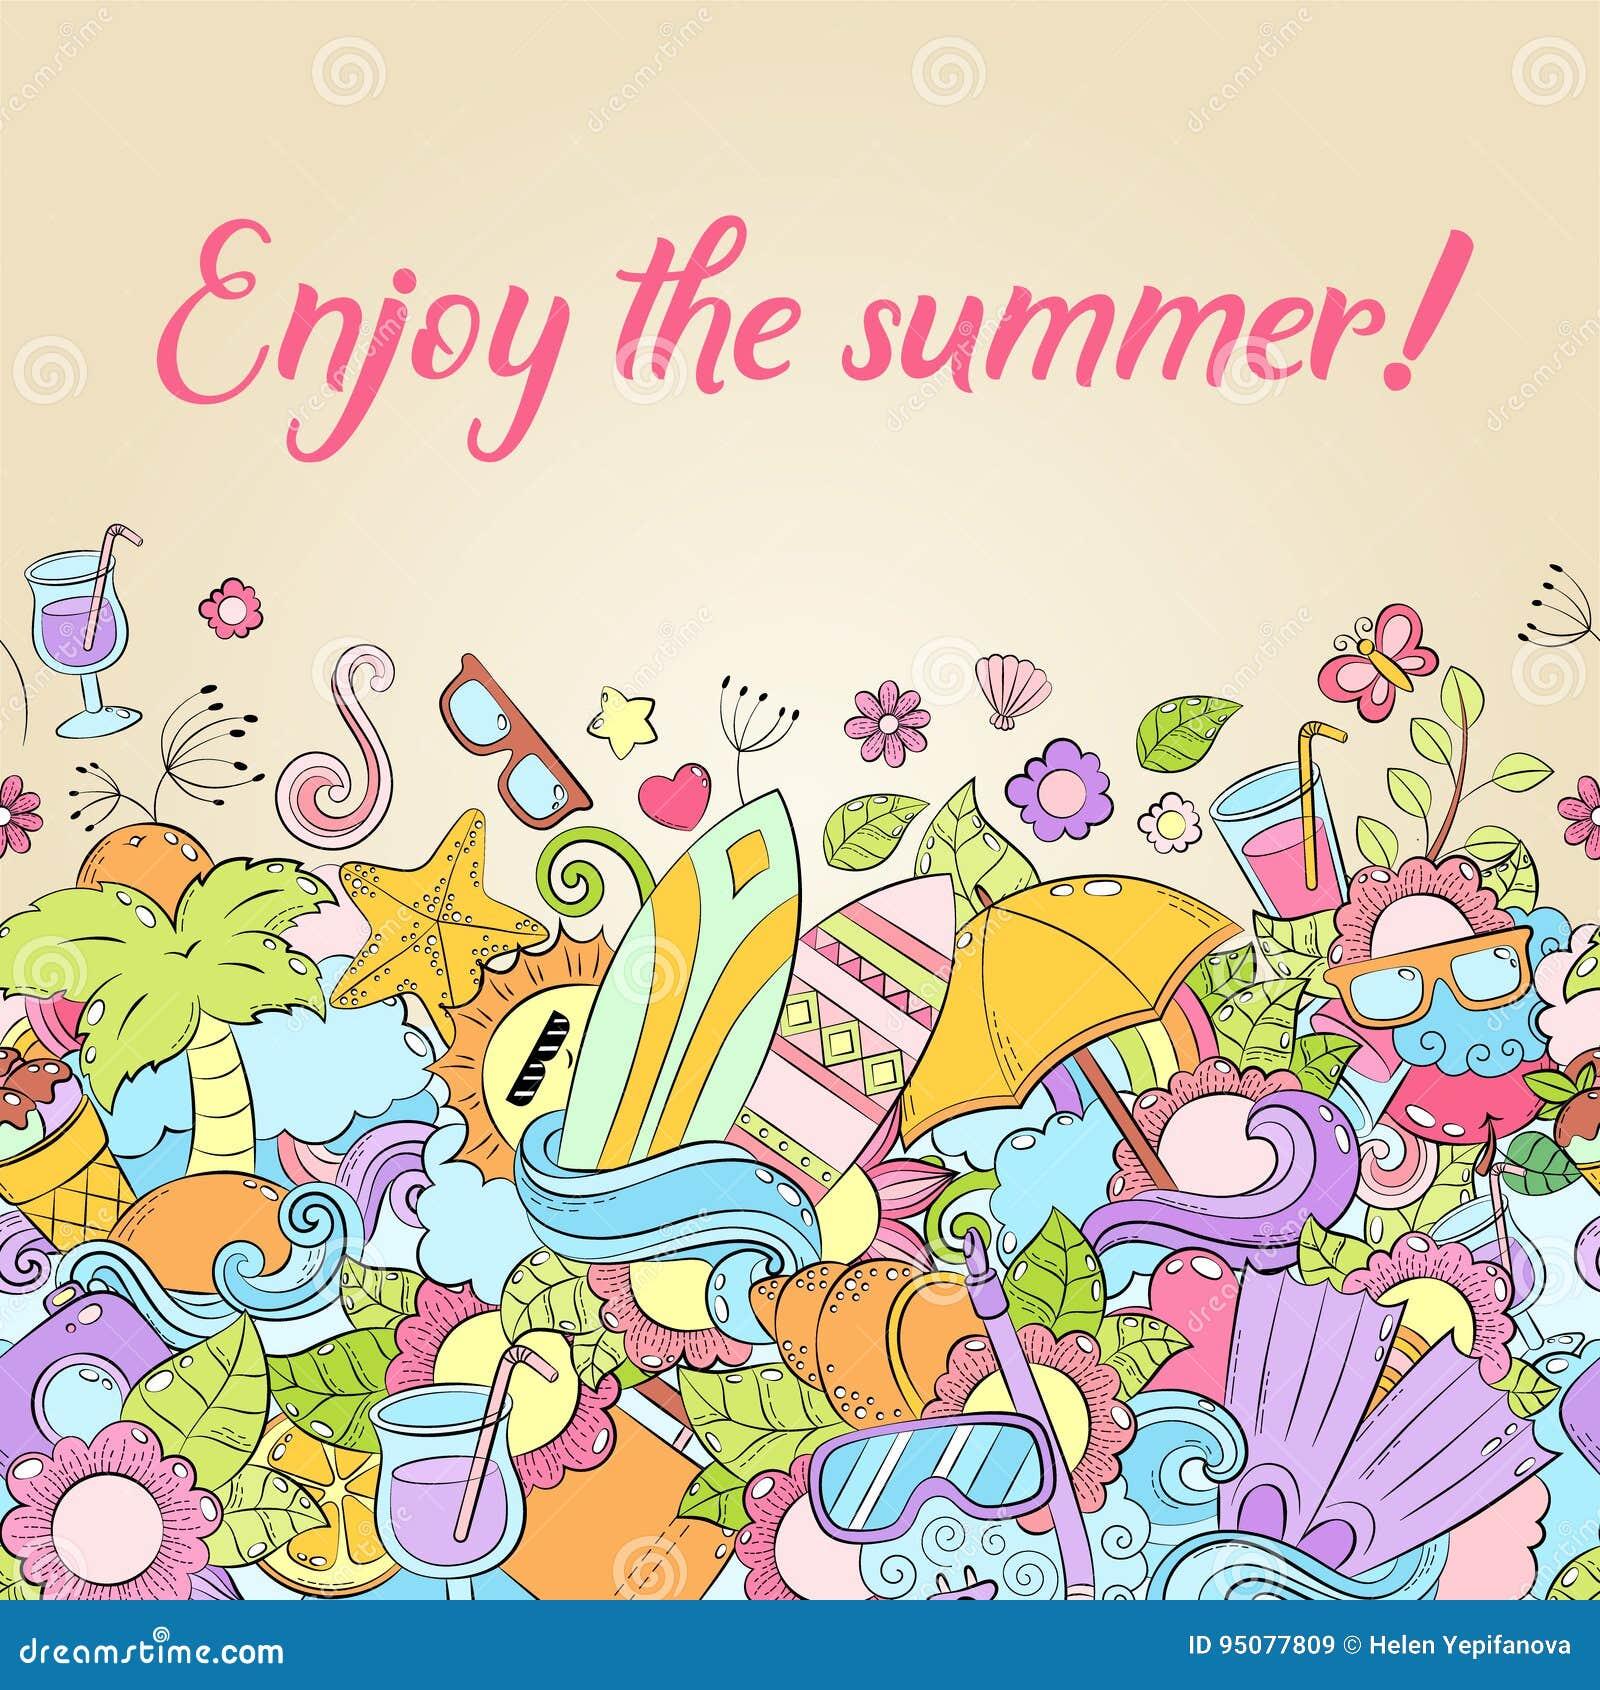 summer background wallpaper texture postcard card template for